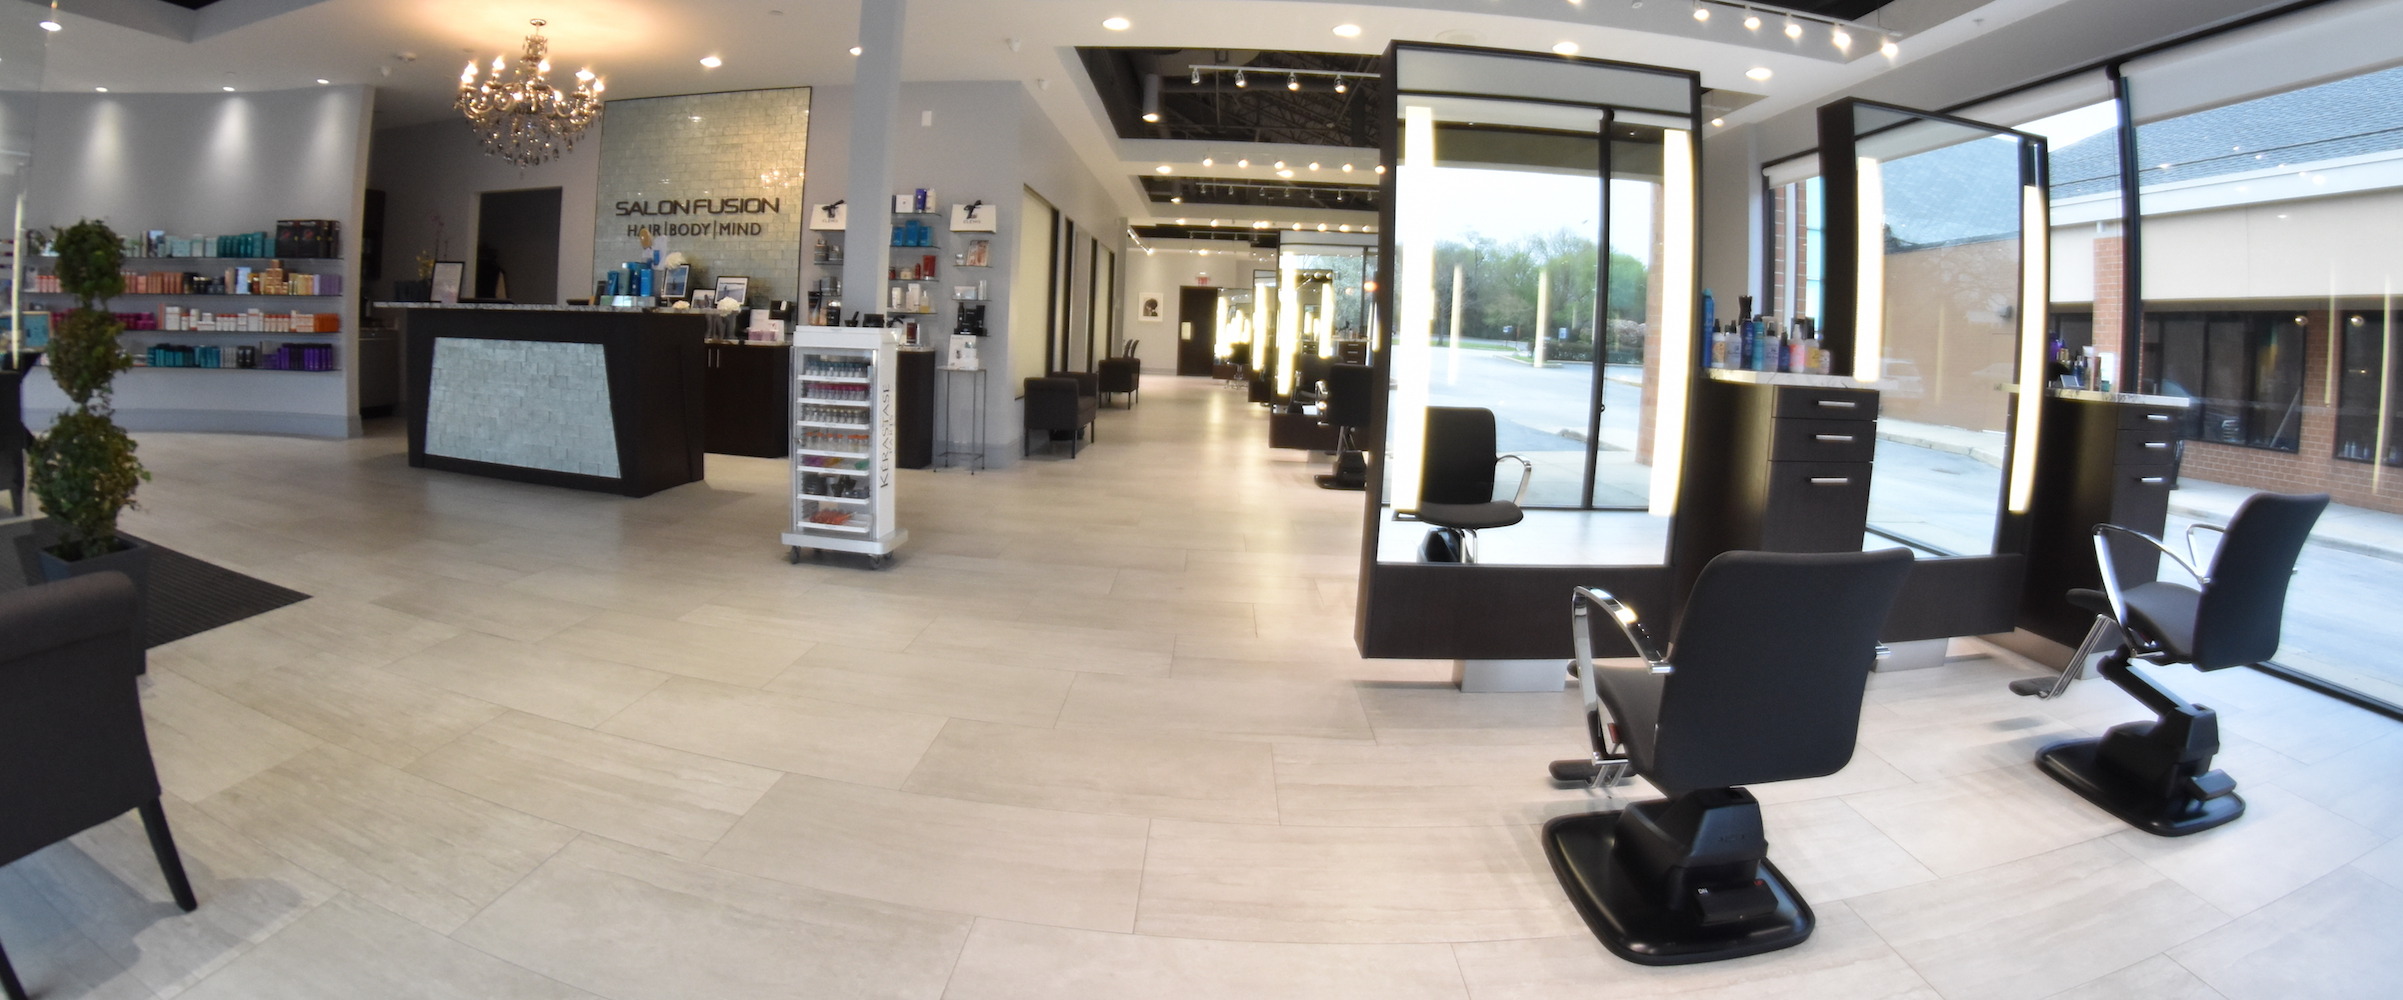 Salon Services | Salon Fusion